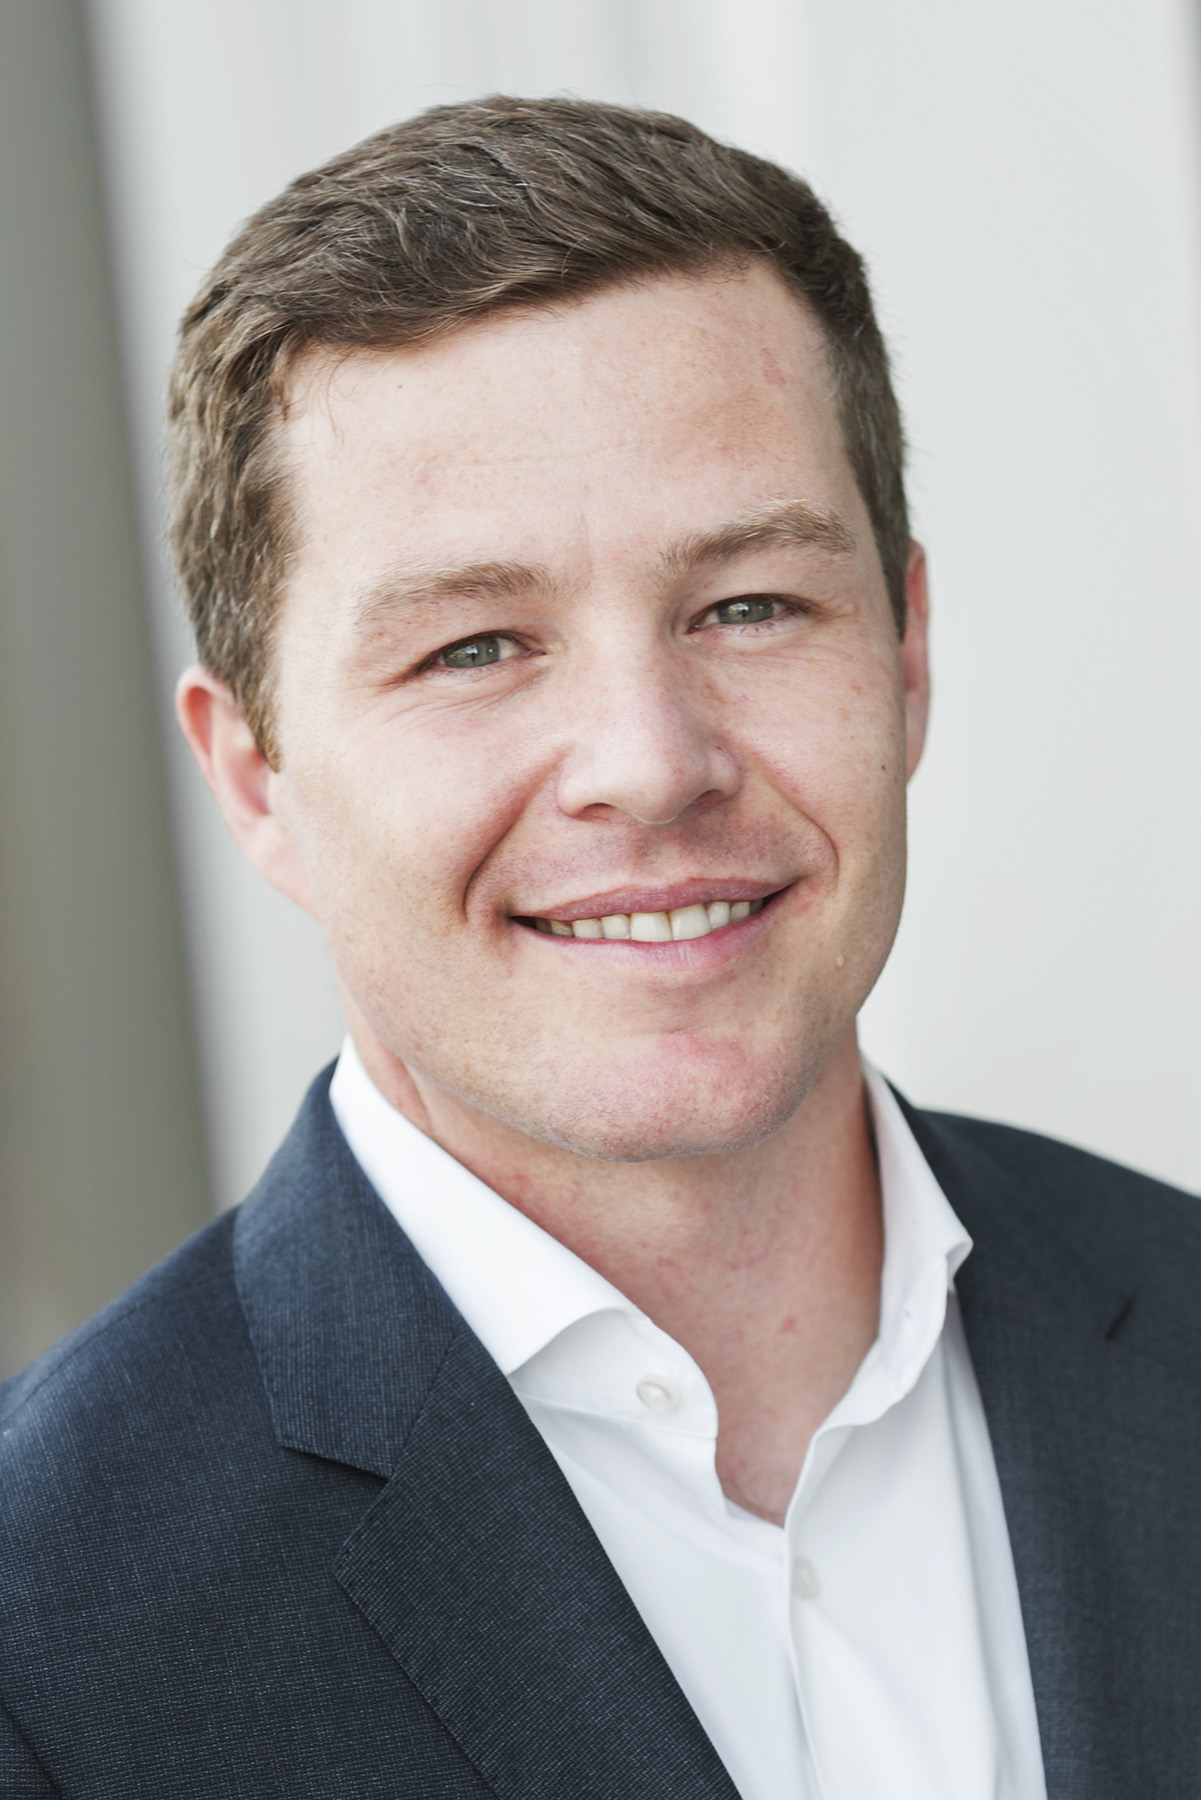 Business Portrait for Chad Dymond